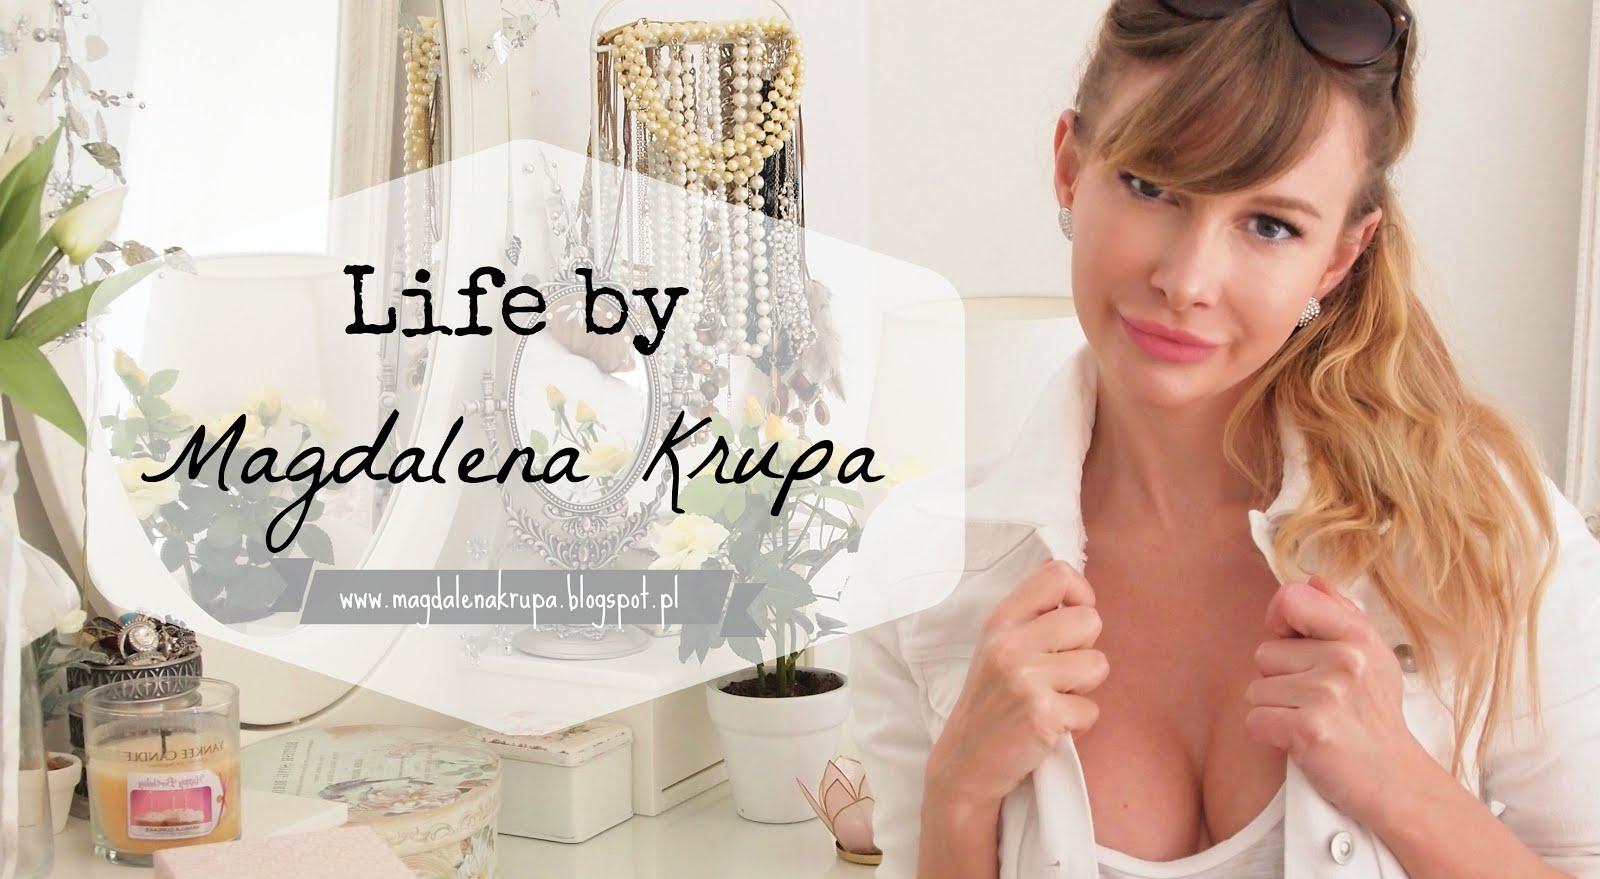 Life by Magdalena